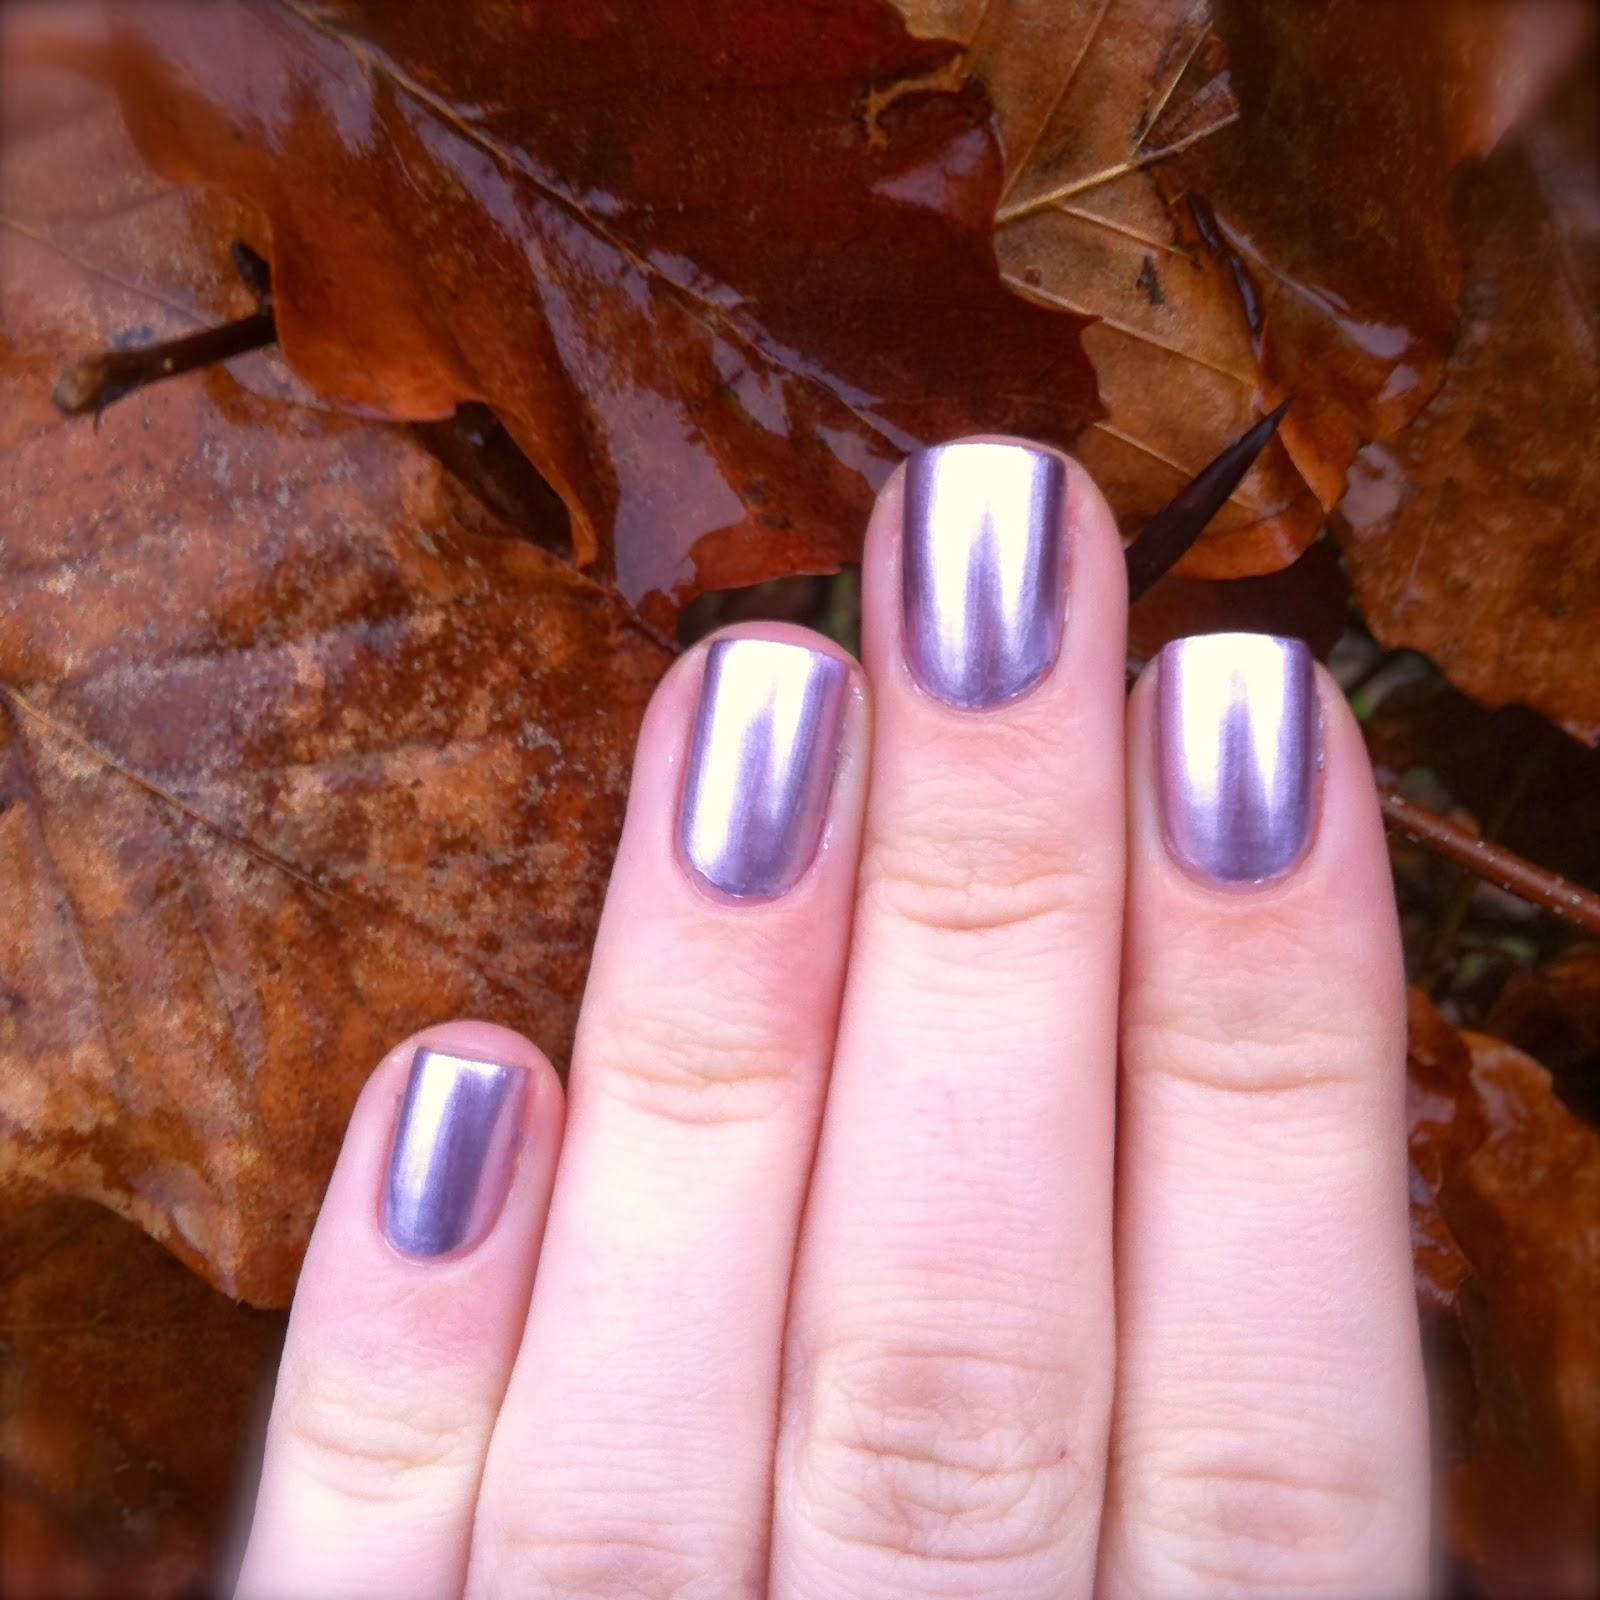 Nails Always Polished: Essie Nothing Else Metals